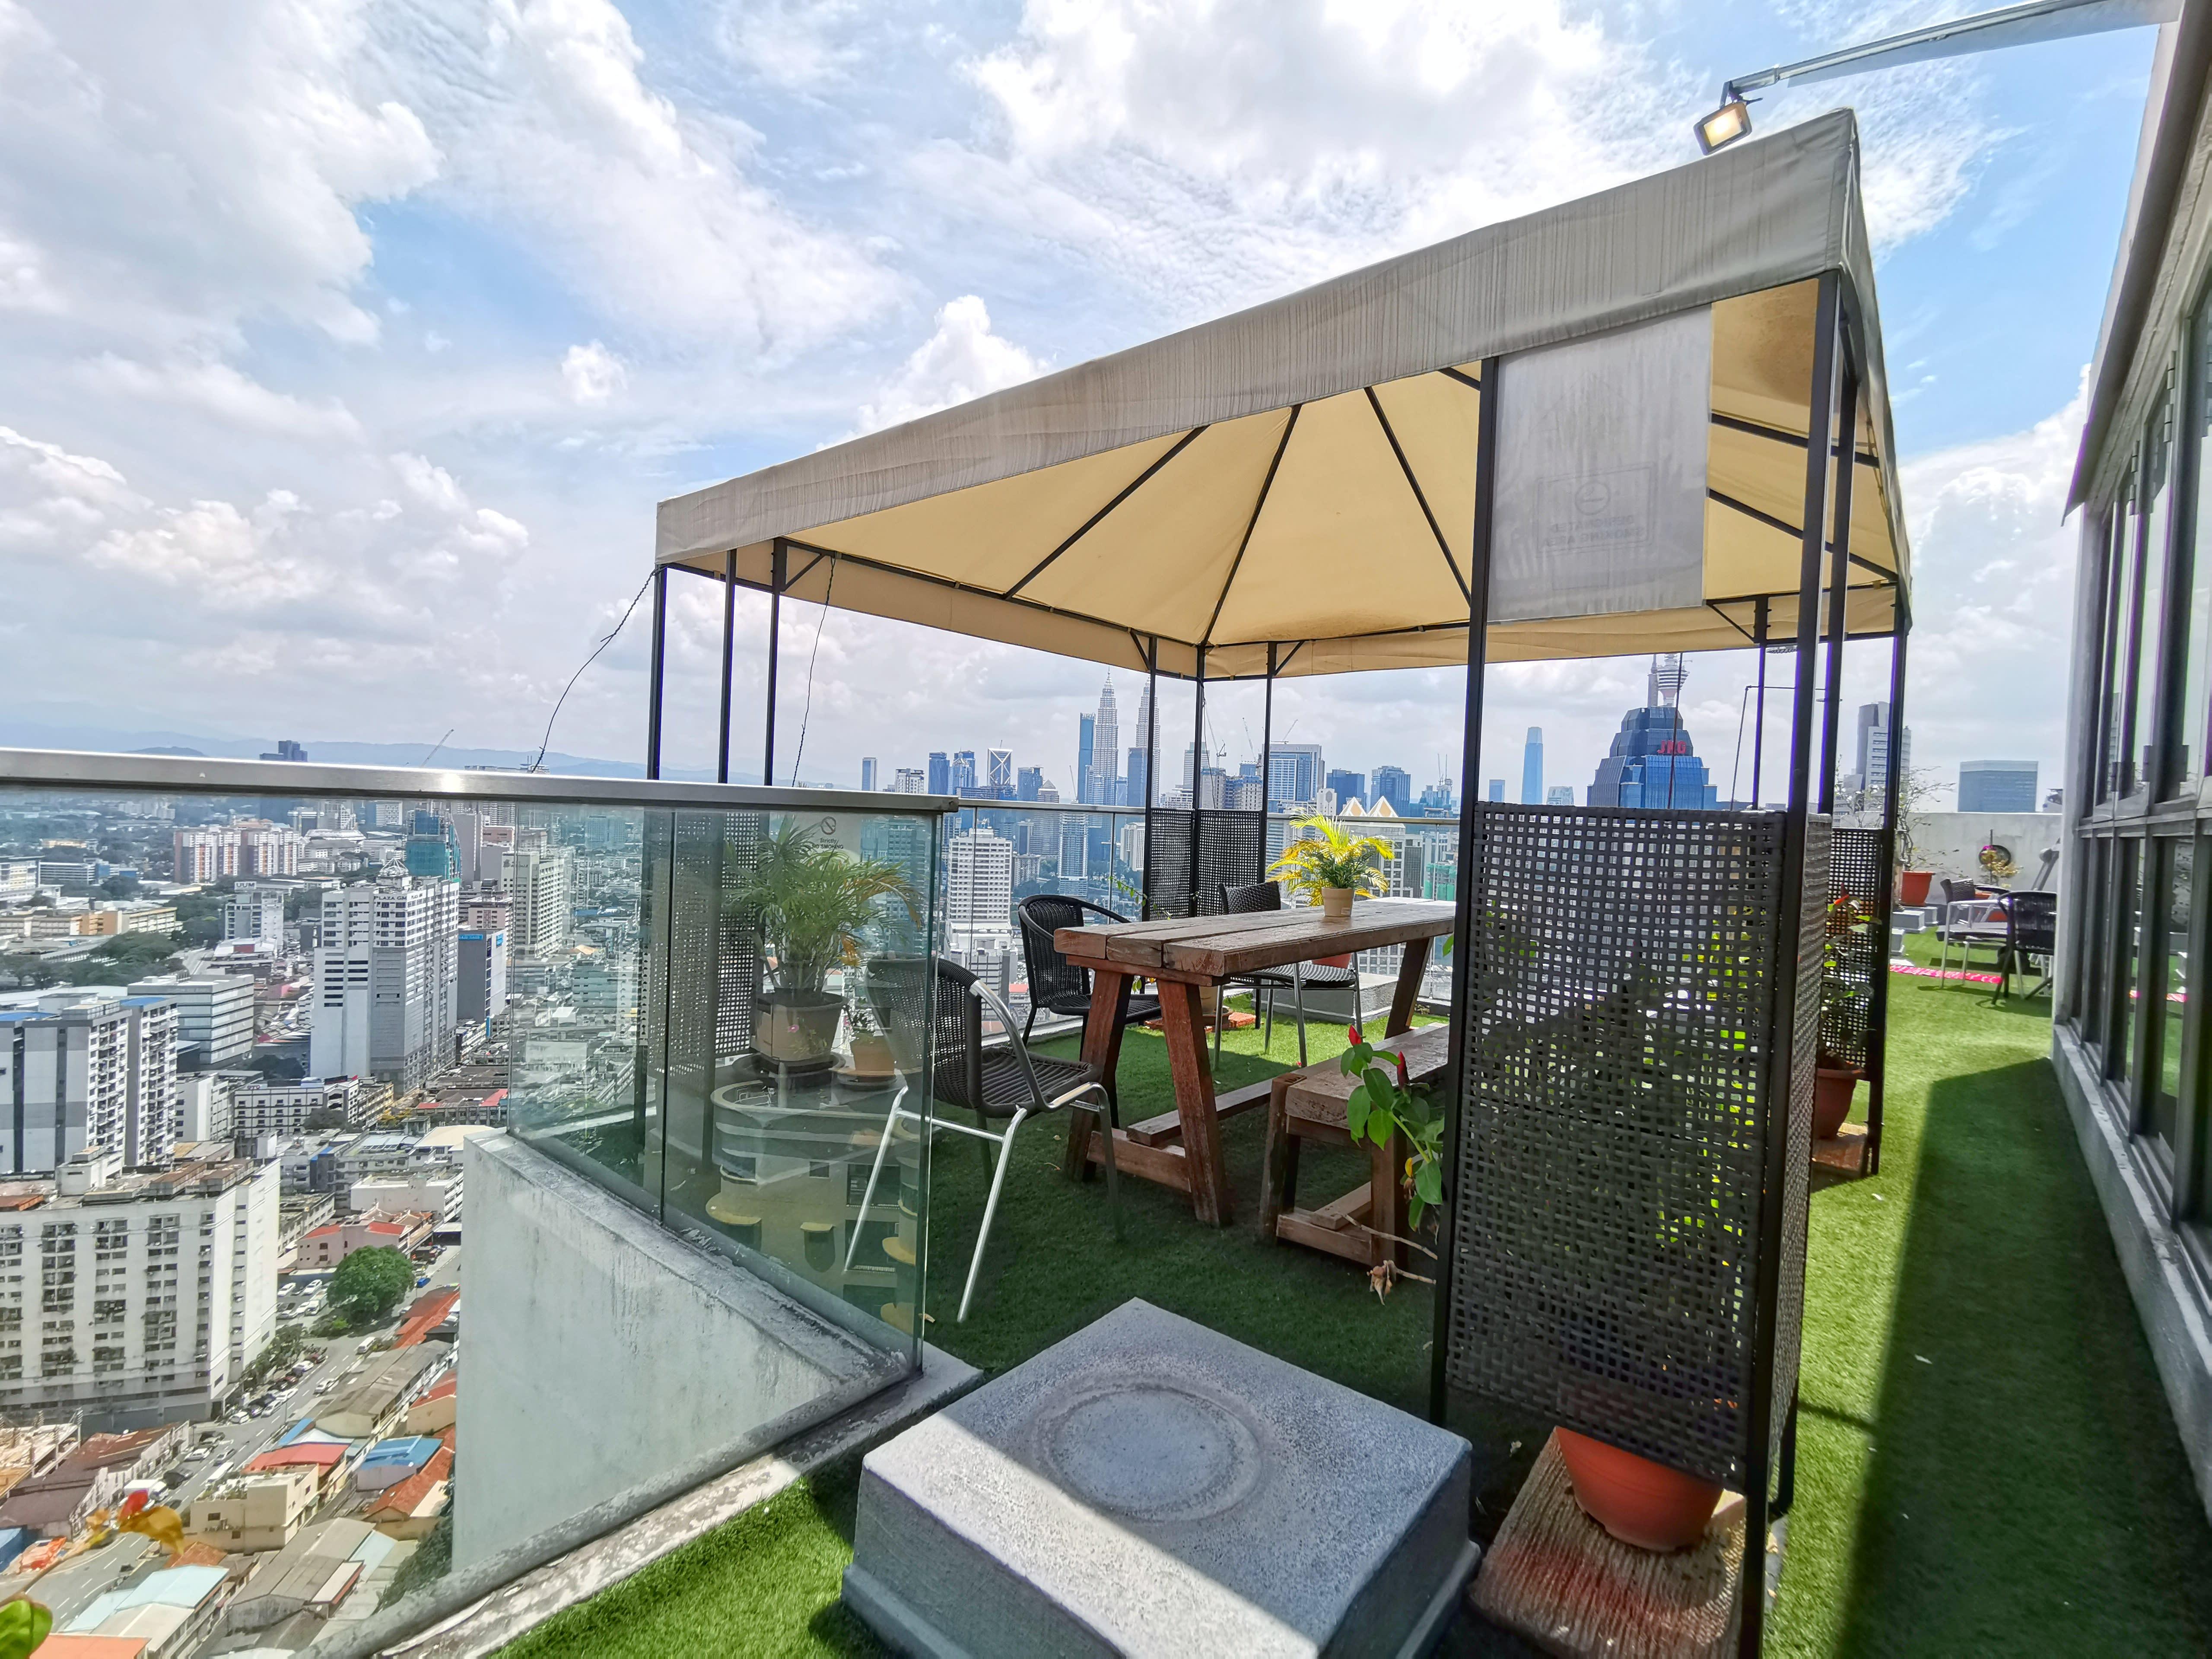 HOSTEL - Penthouse on 34-The Highest Hostel in Kuala Lumpur